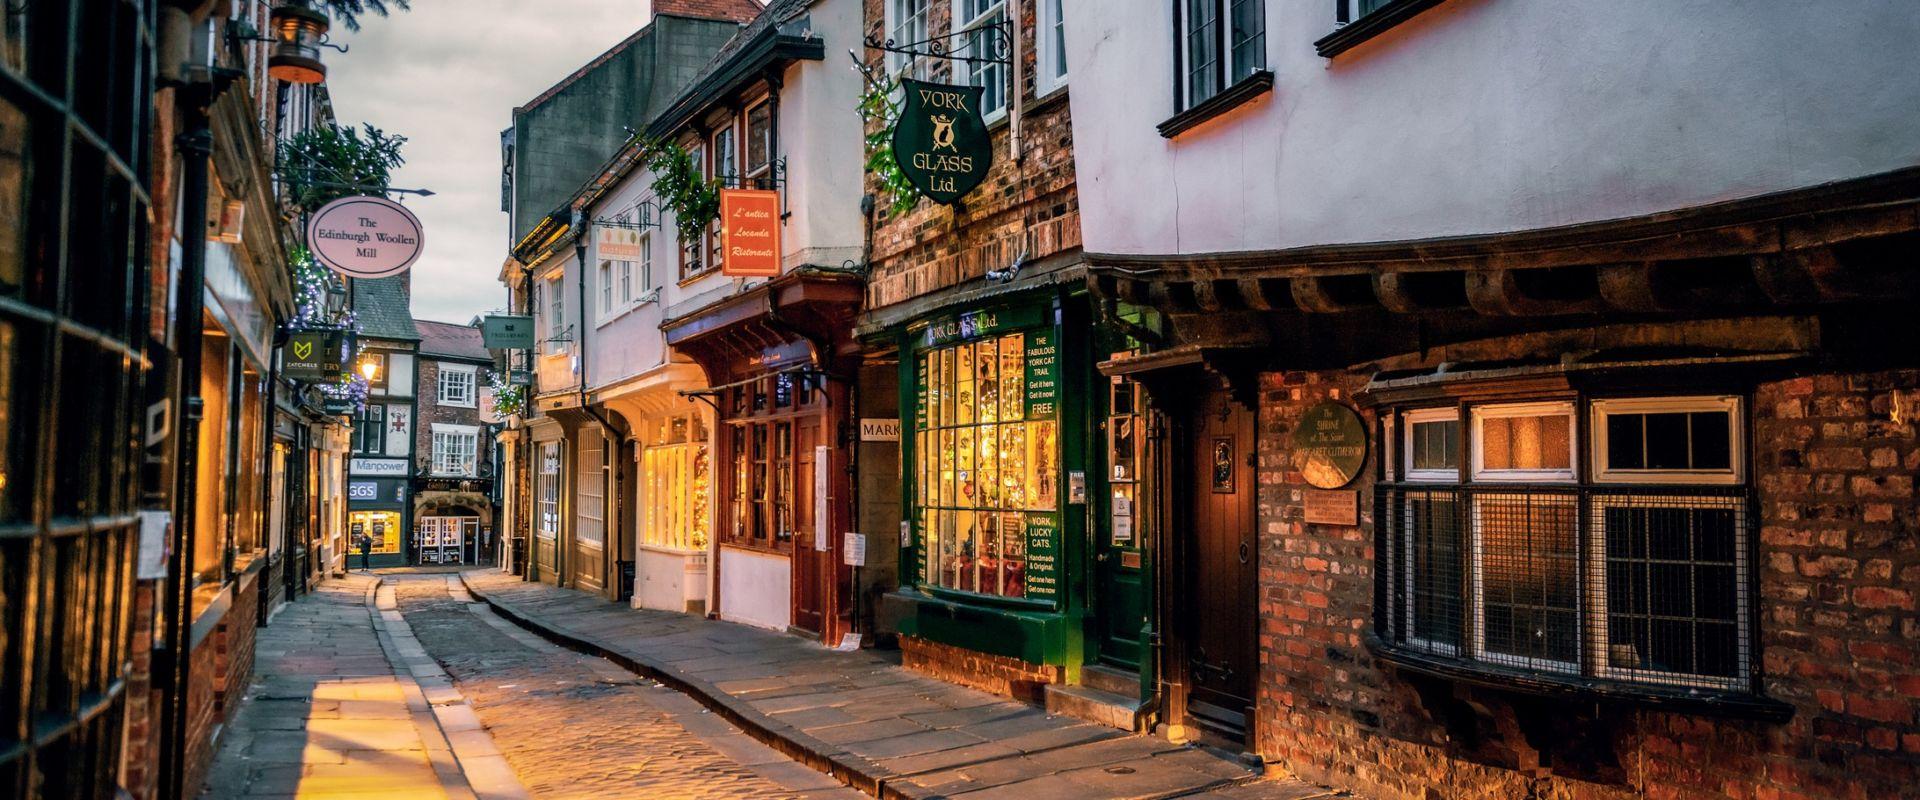 The Shambles in York, UK